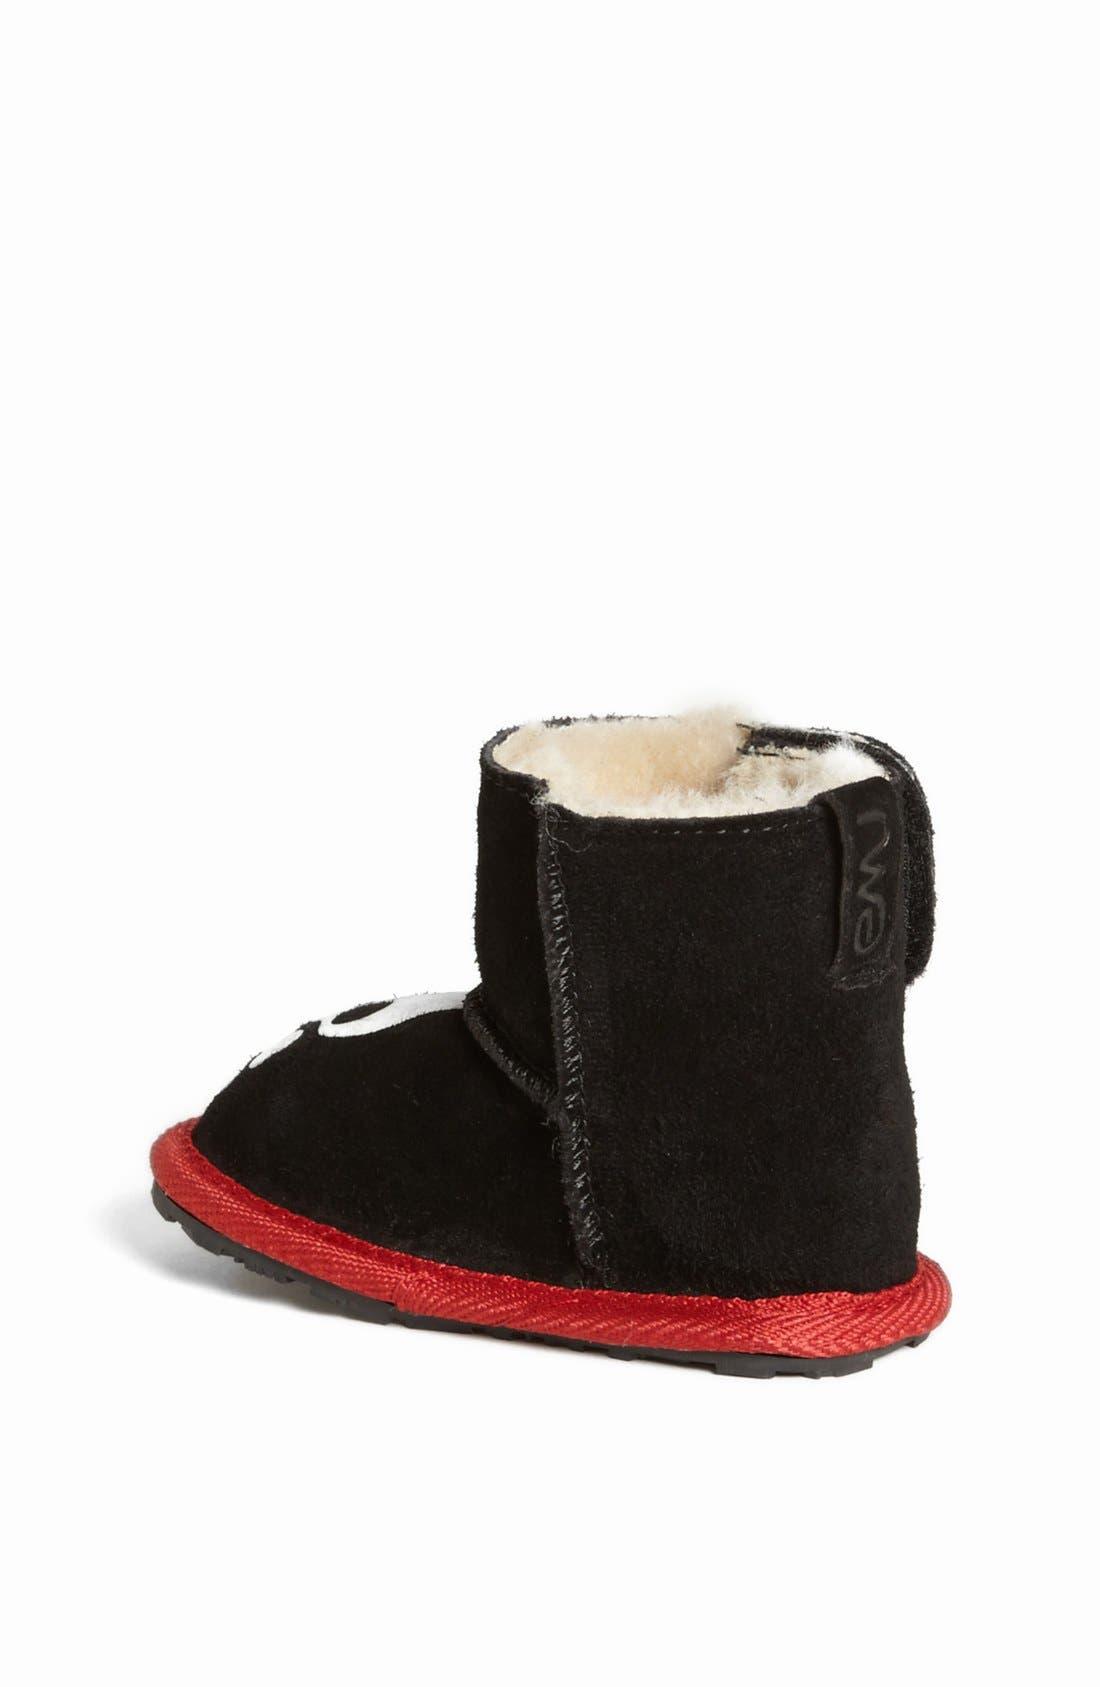 Alternate Image 2  - EMU Australia 'Scallywag' Boot (Baby & Walker)